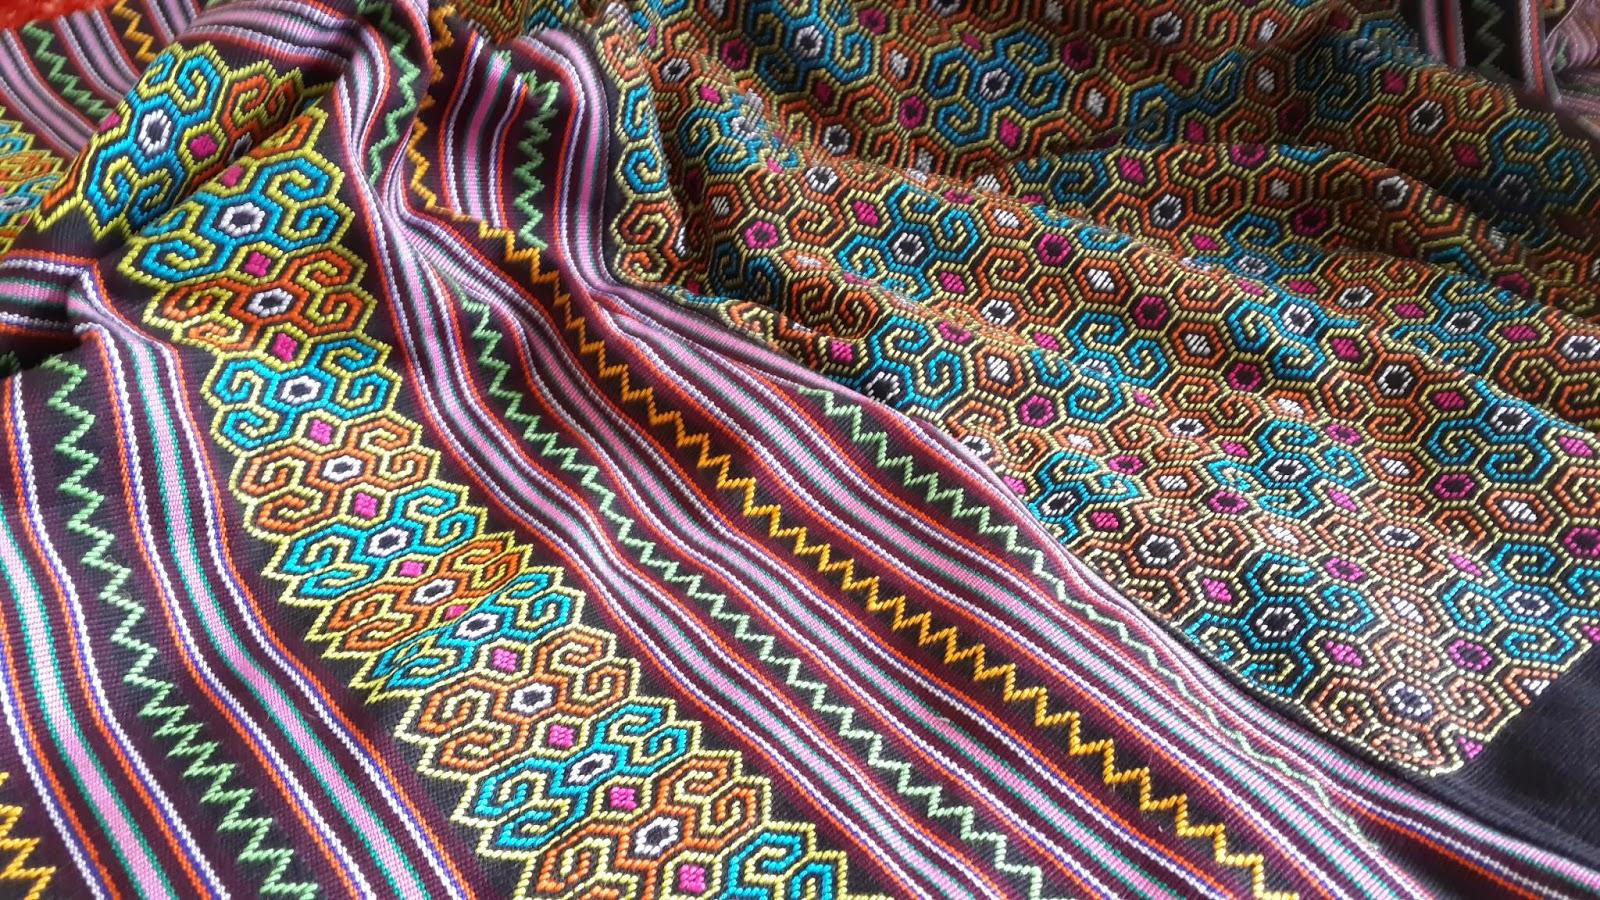 model baju tenun banda aceh   Tenun NTT Banda Aceh